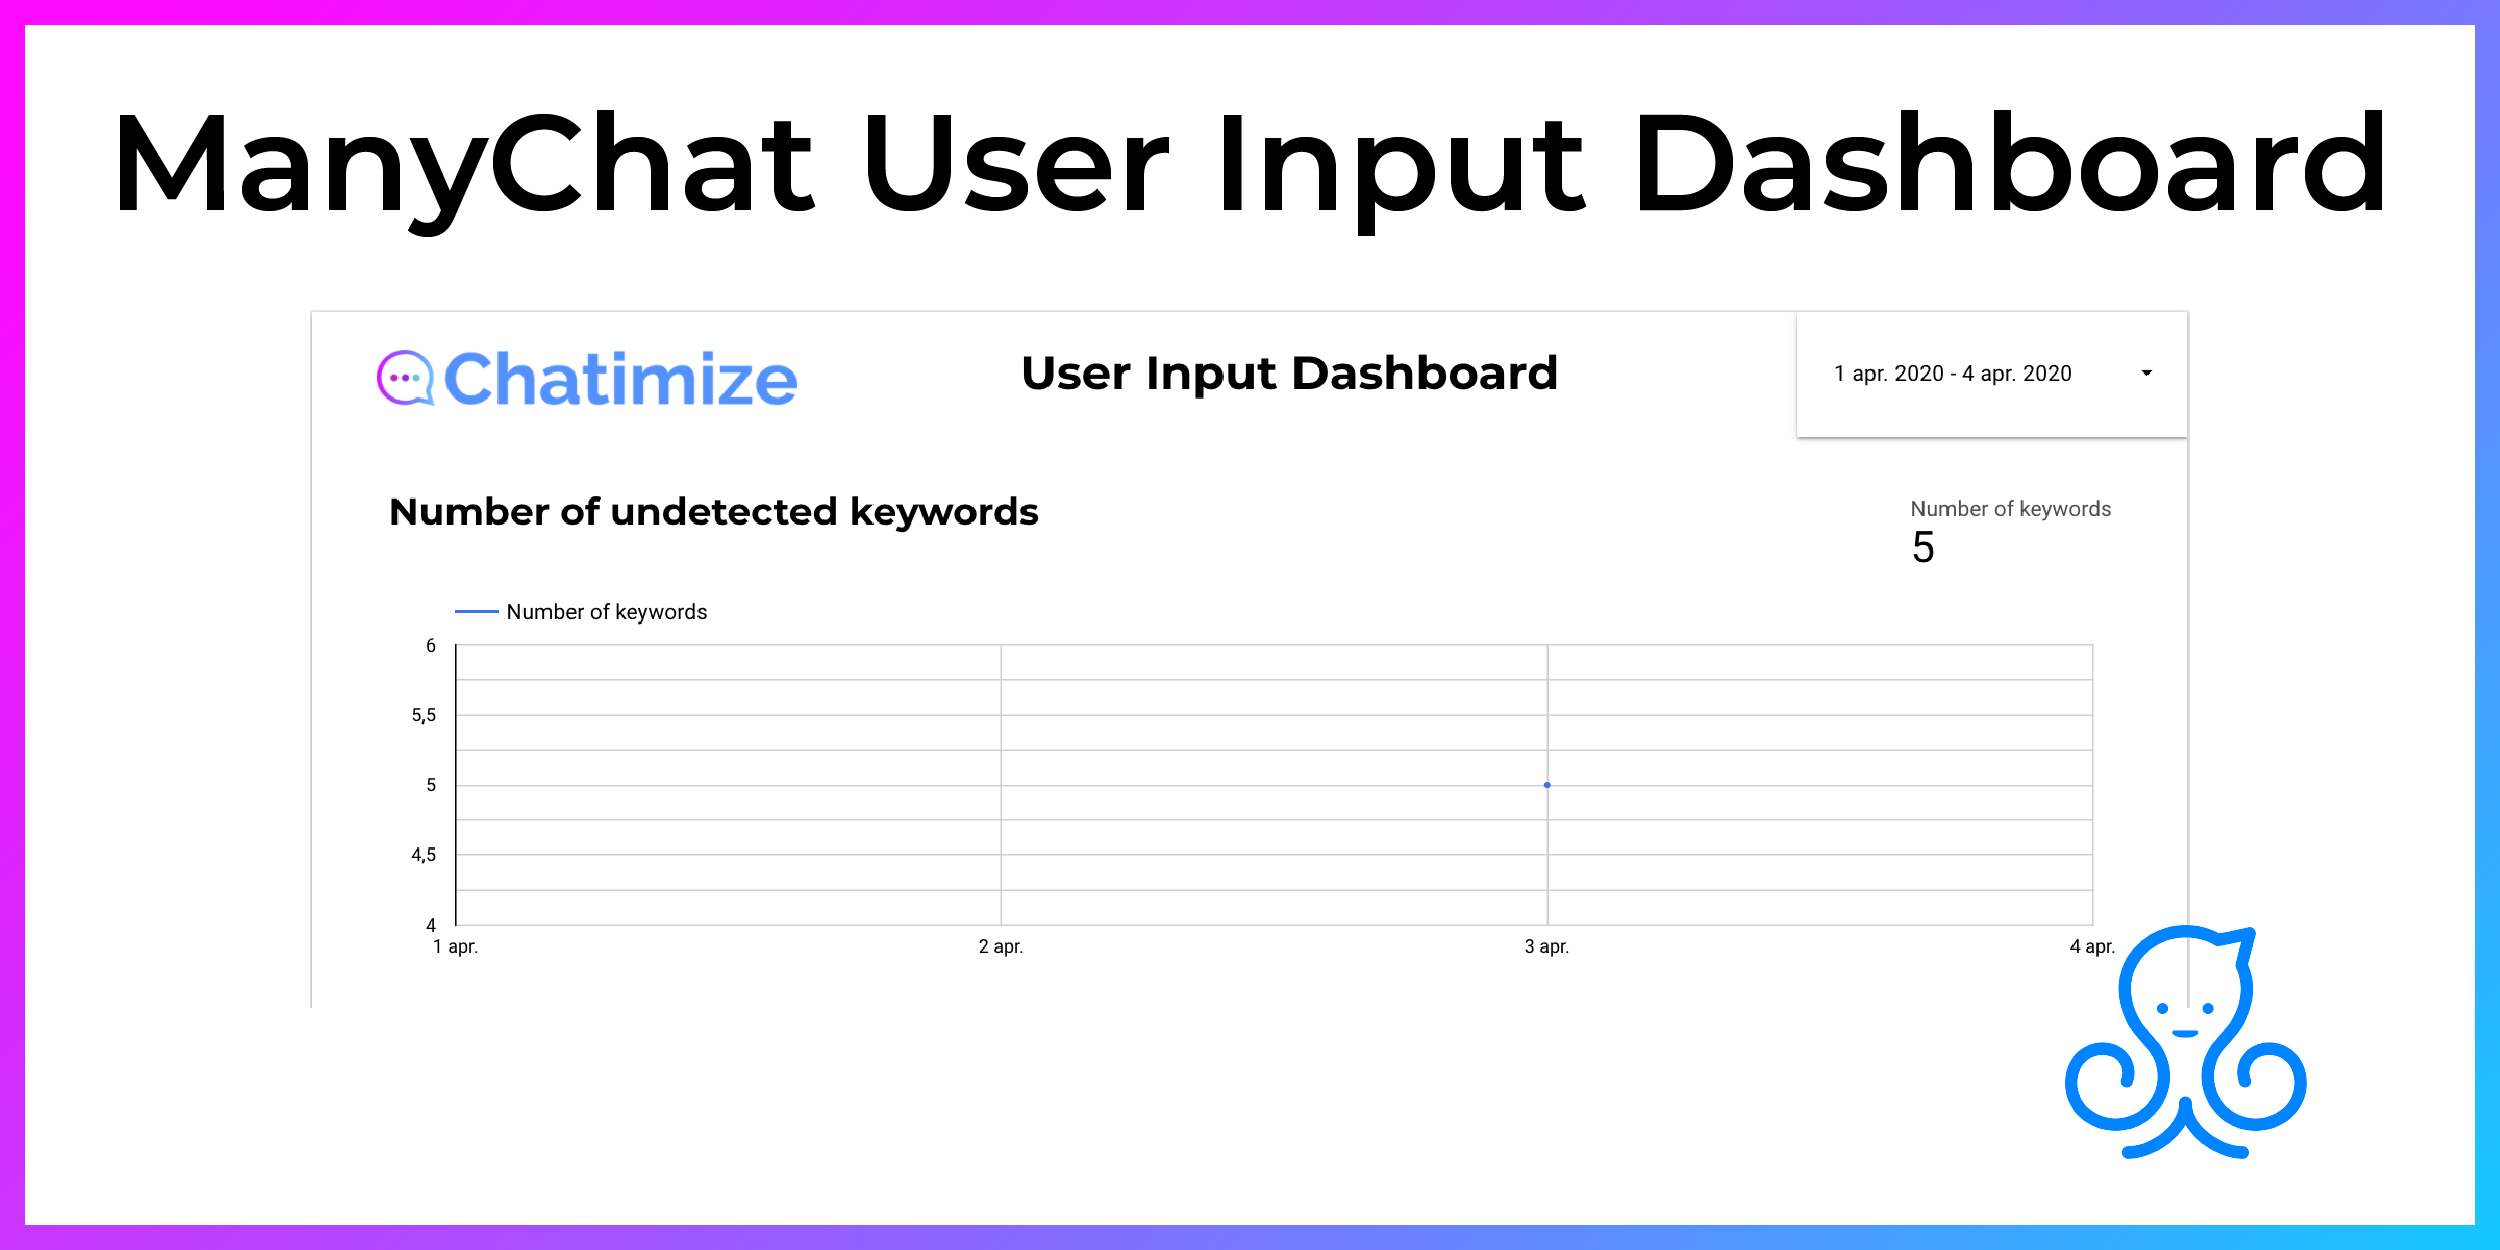 ManyChat User Input Dashboard